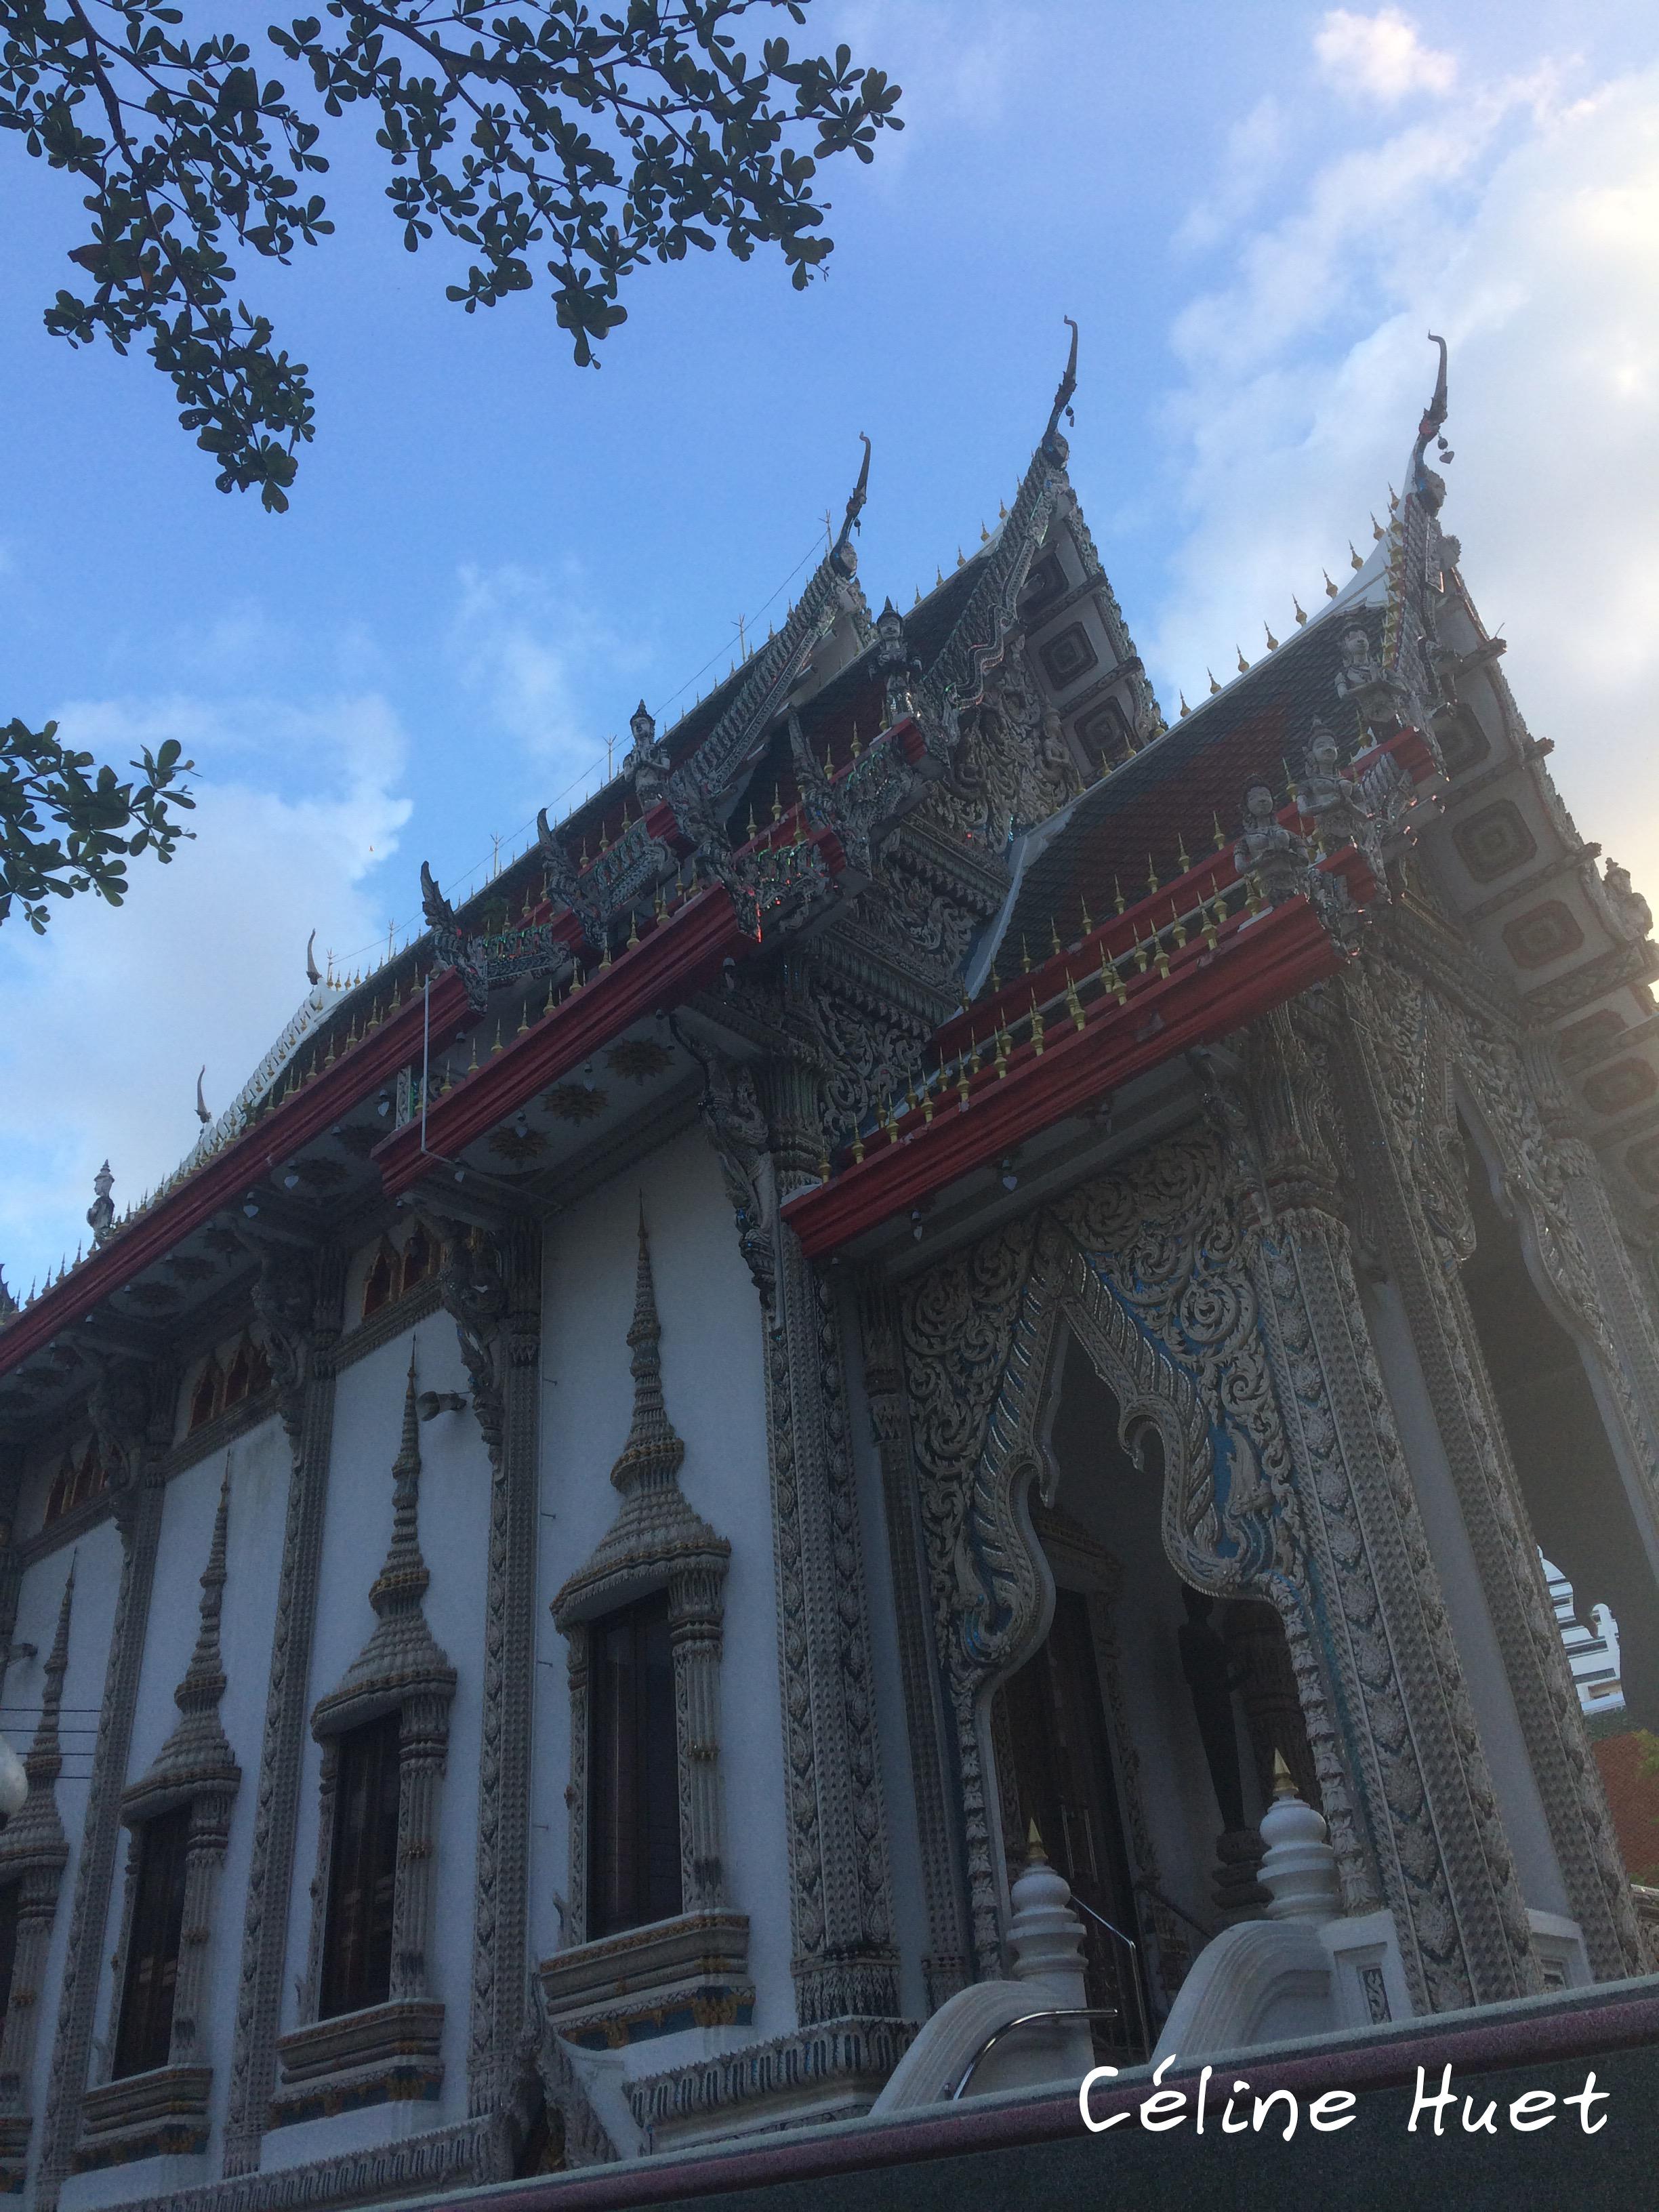 Cathédrale de l'Assomption Bangkok Thaïlande Asie